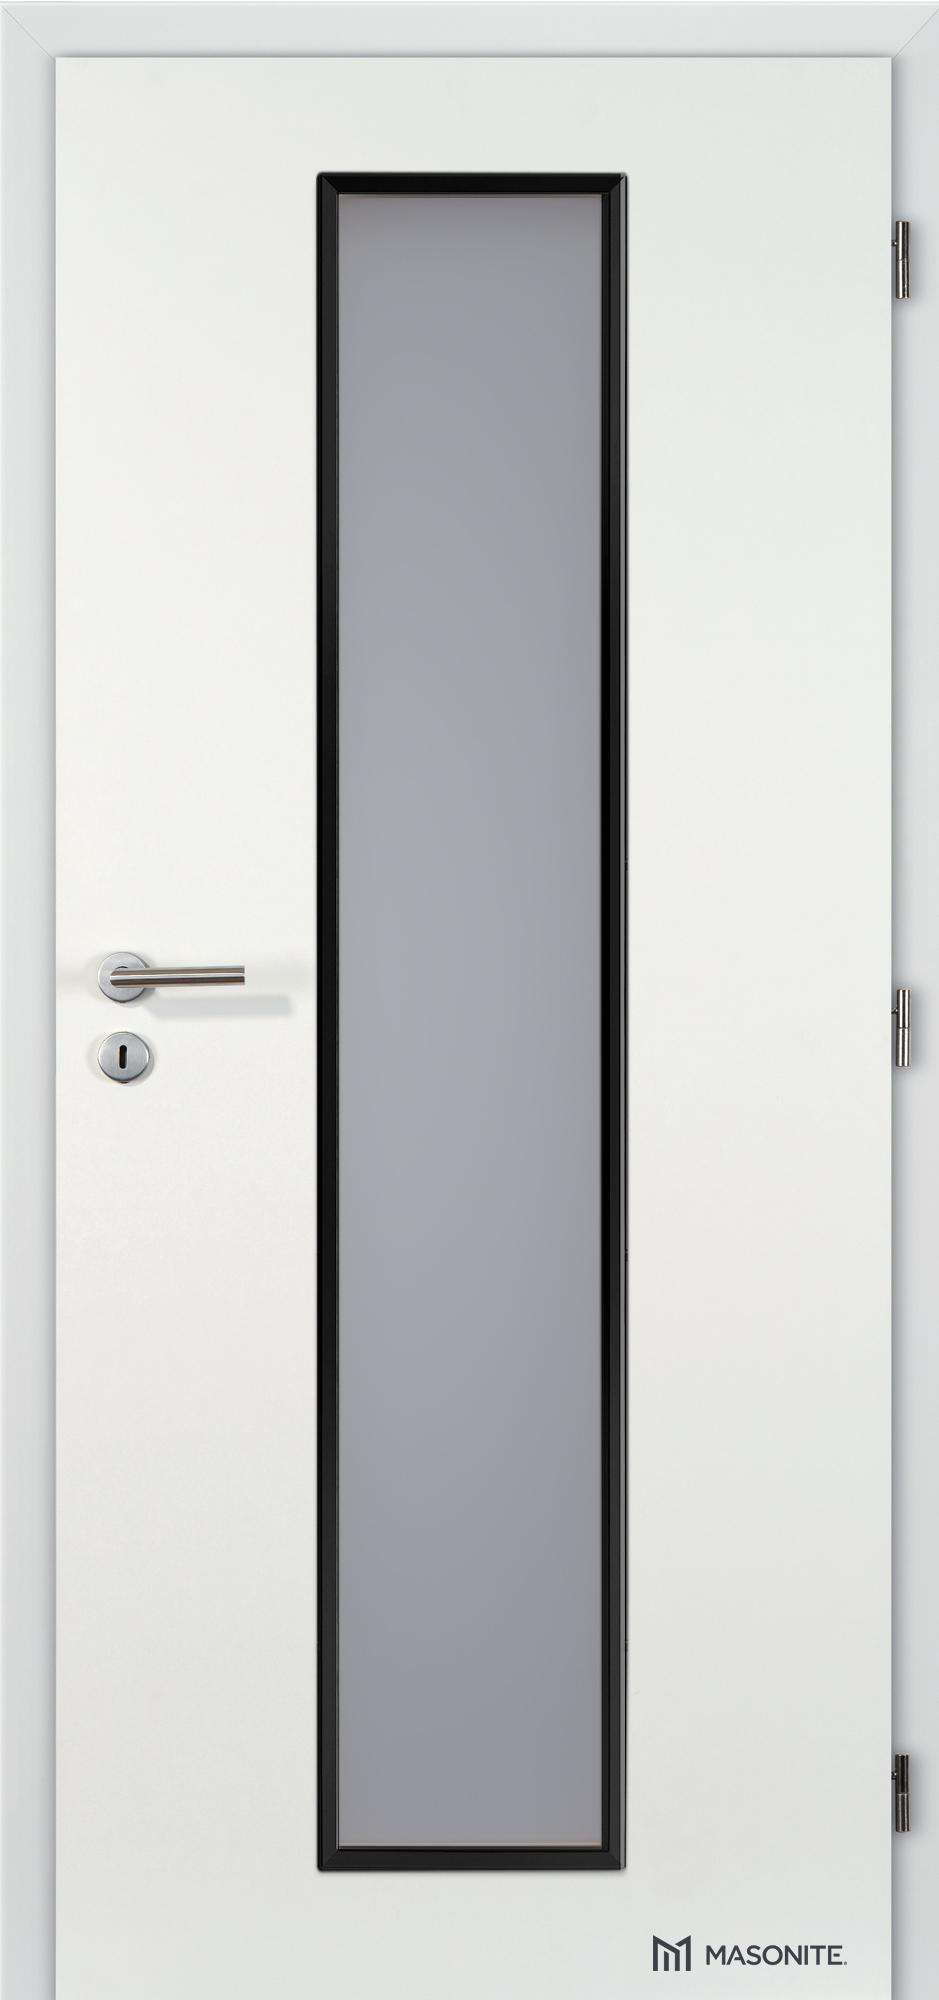 MASONITE - interiérové dveře CLARA LINEA